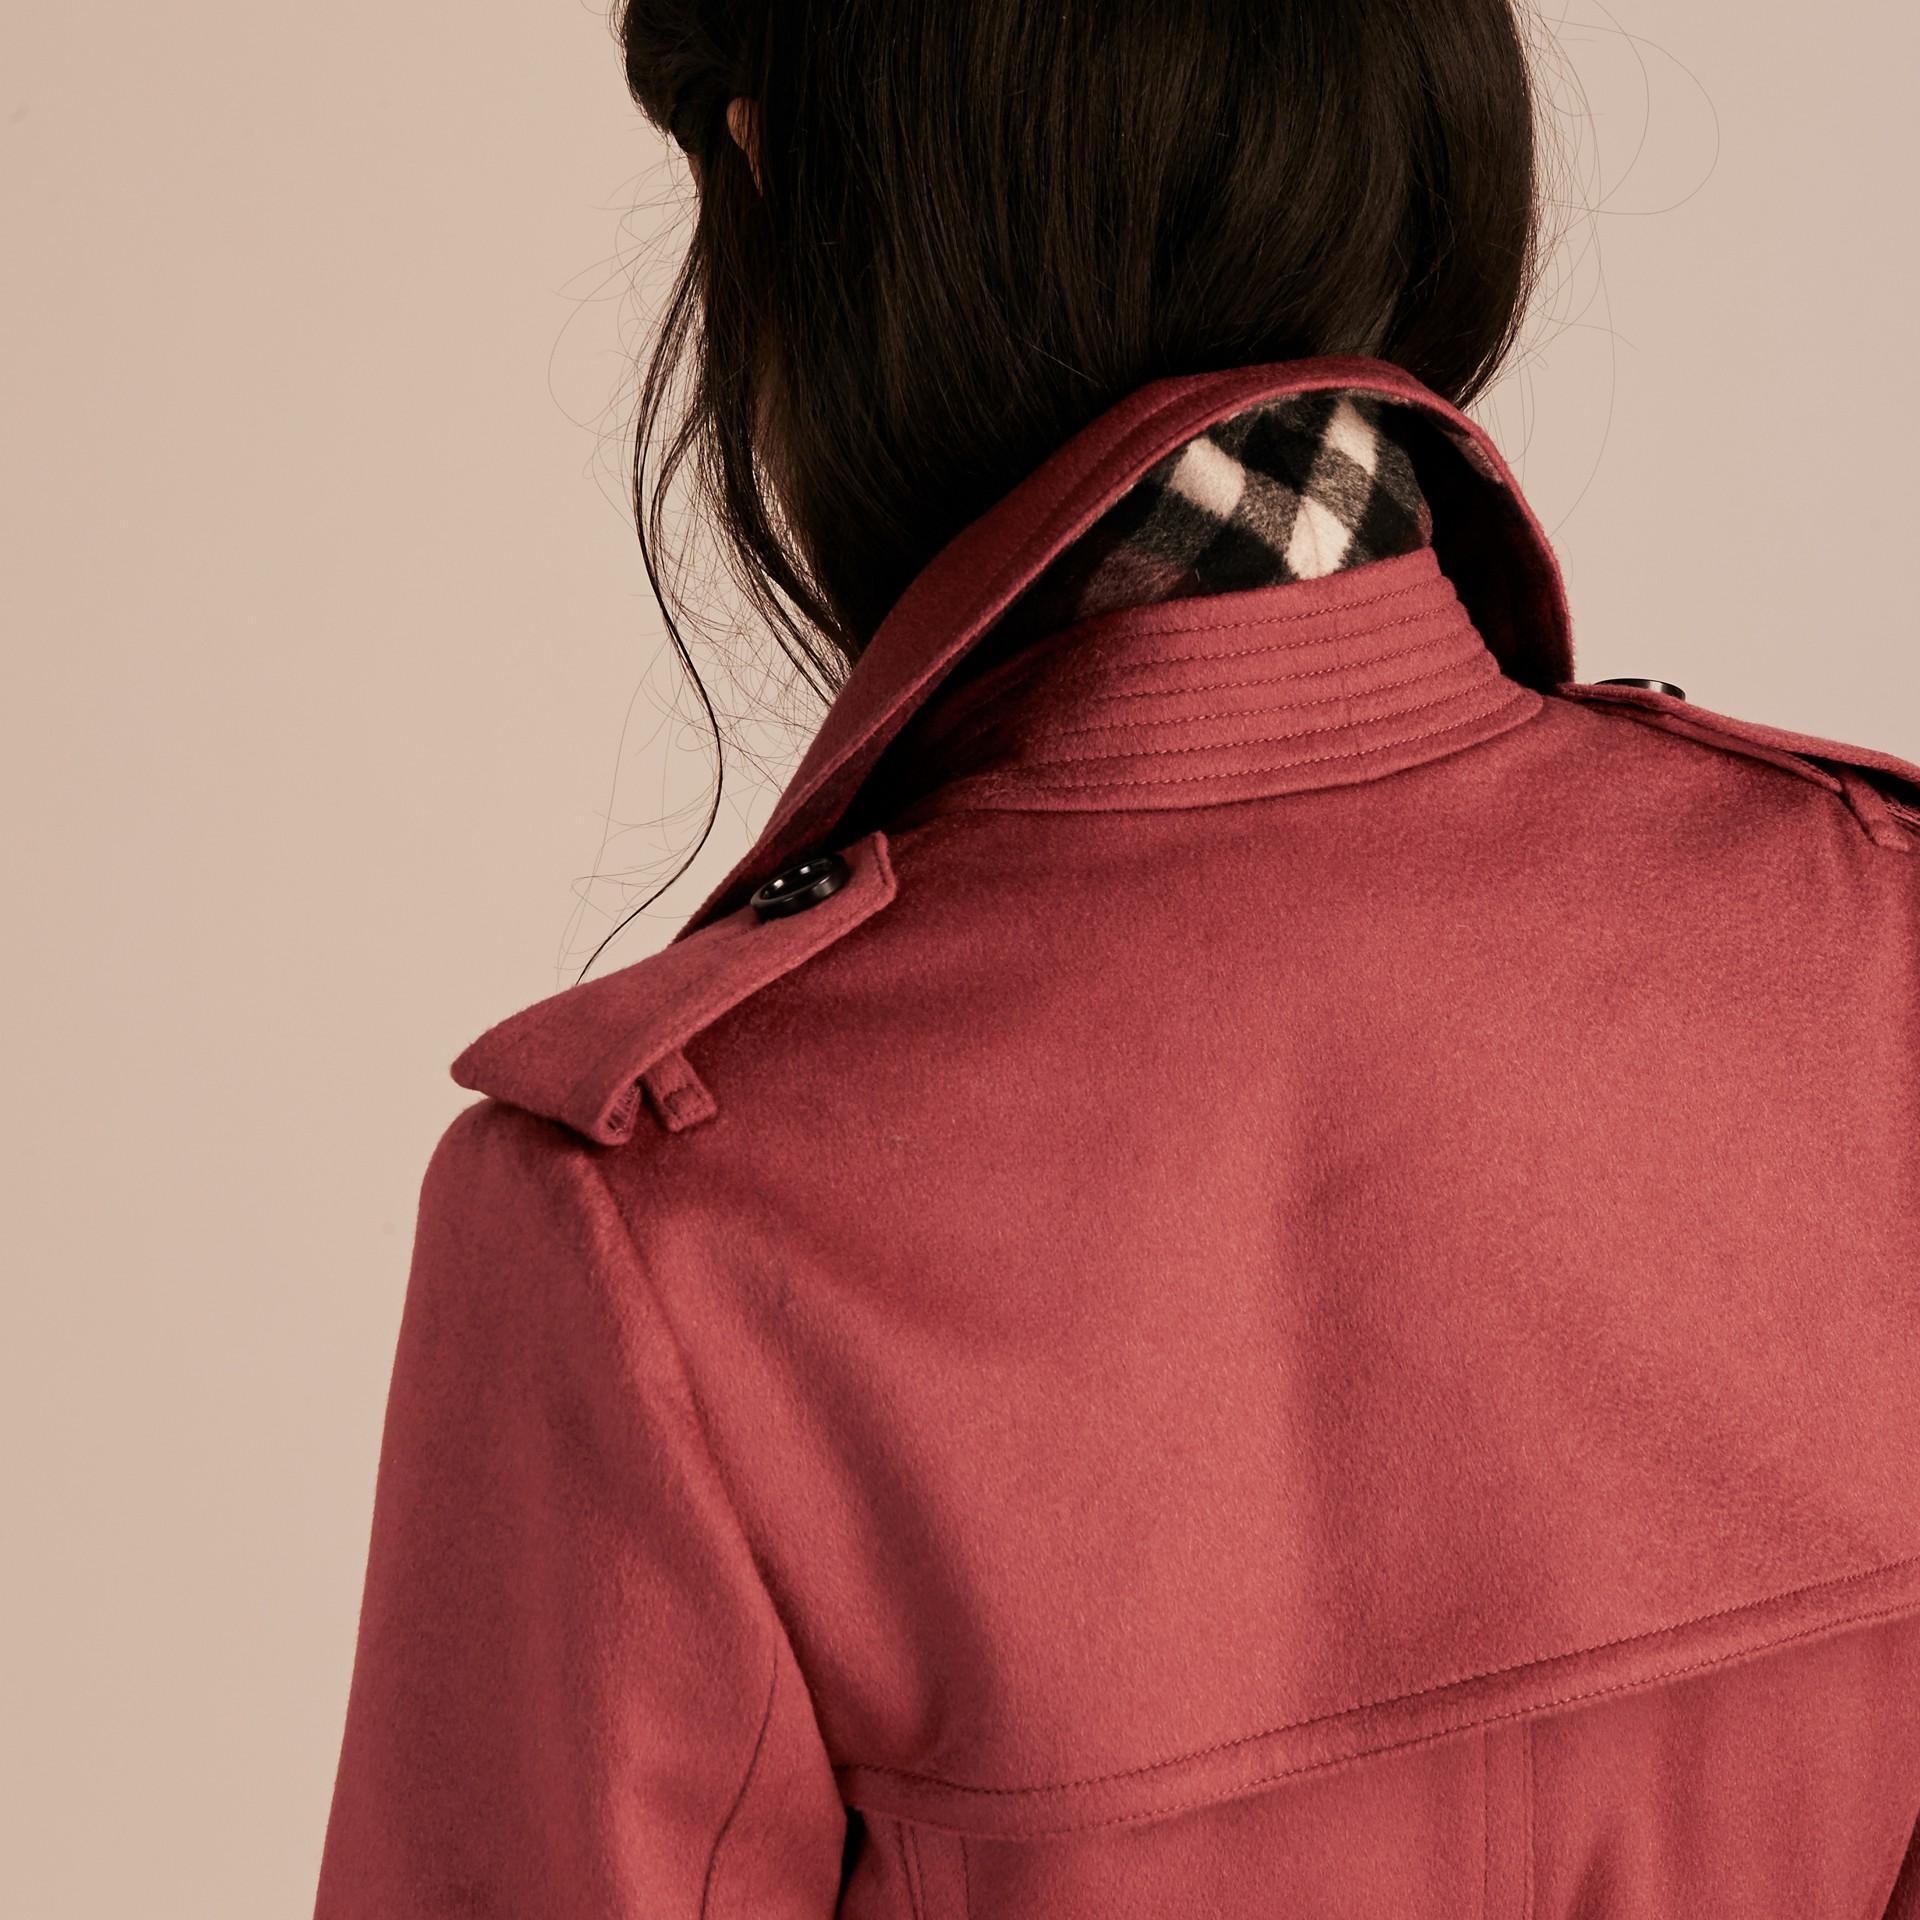 Rose pivoine cendrée Trench-coat portefeuille en cachemire Rose Pivoine Cendrée - photo de la galerie 6